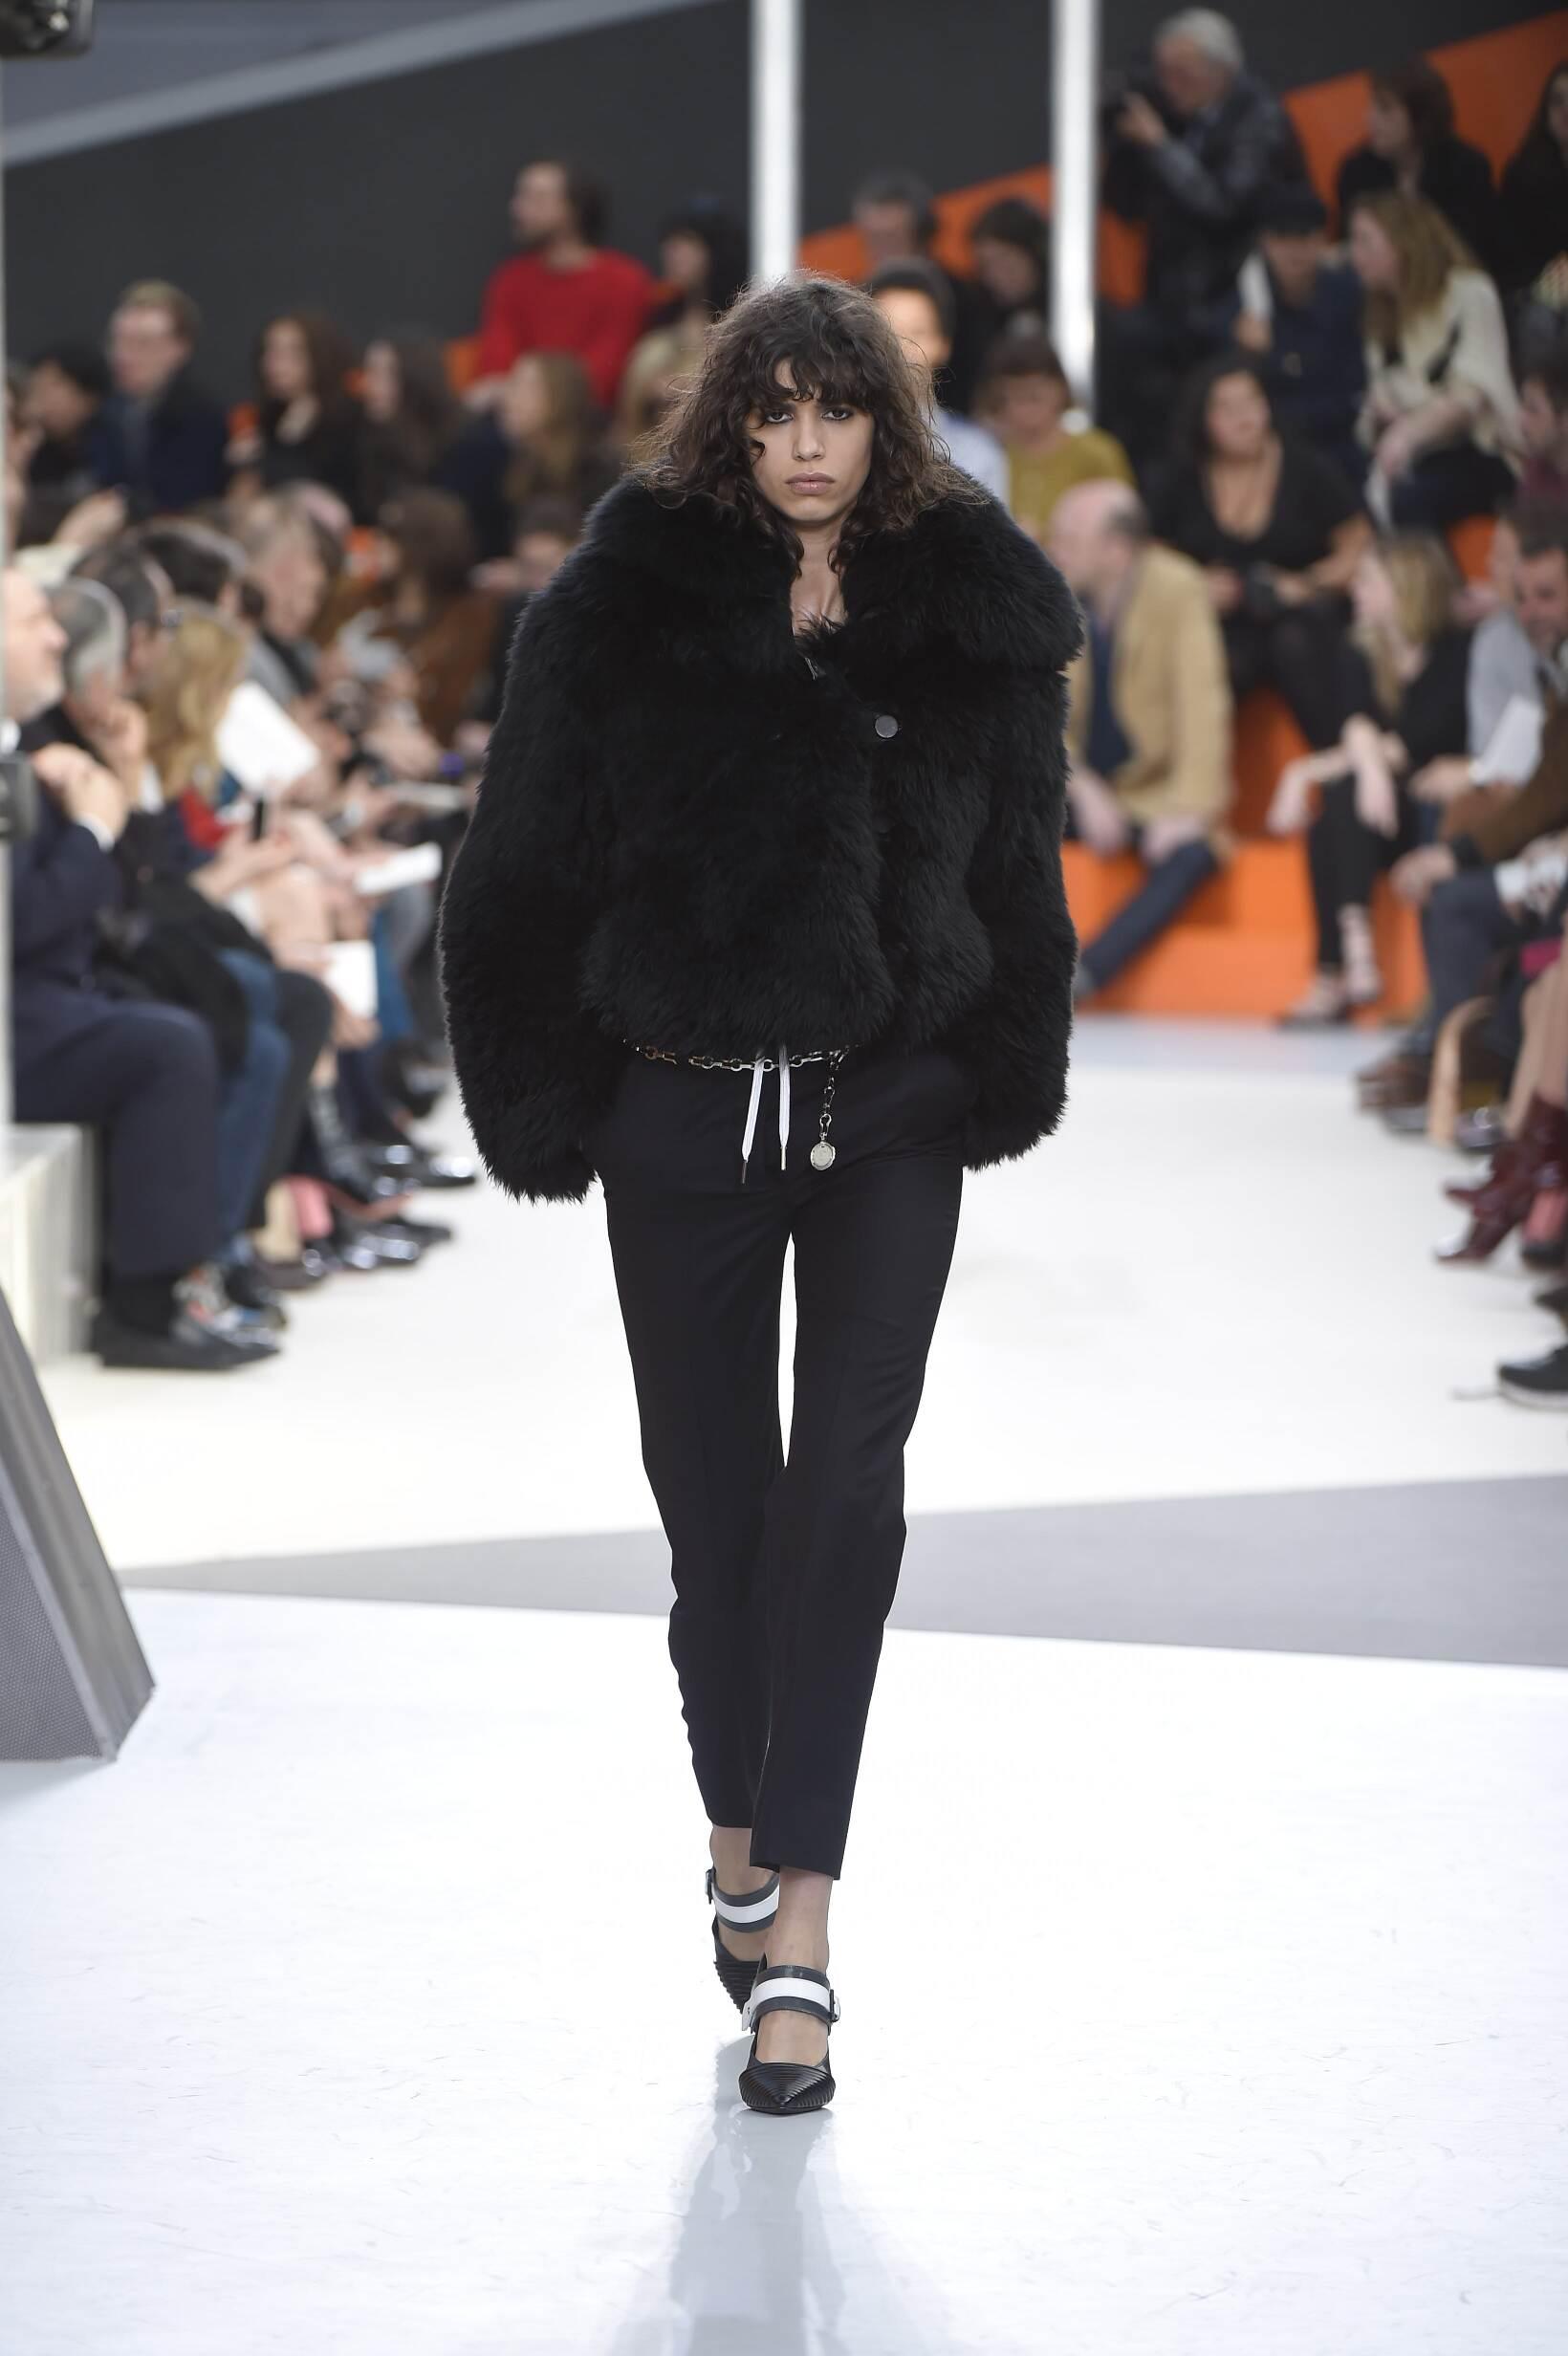 Fall Winter 2015 16 Fashion Collection Louis Vuitton